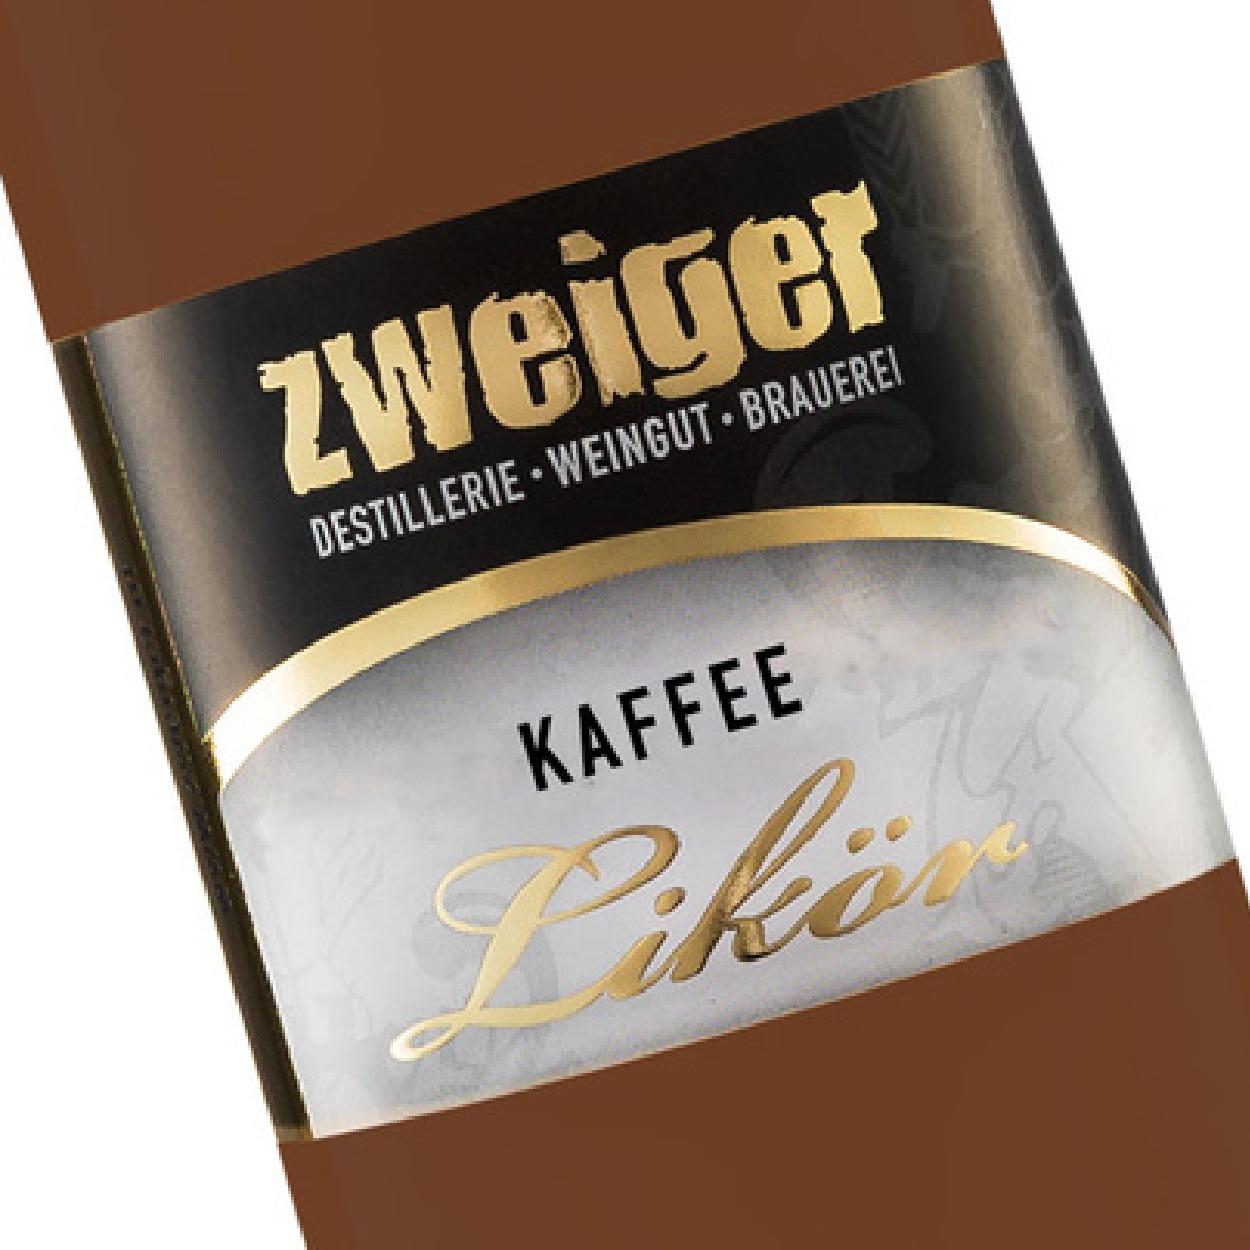 Kaffee Cremelikör Zweiger Destillerie